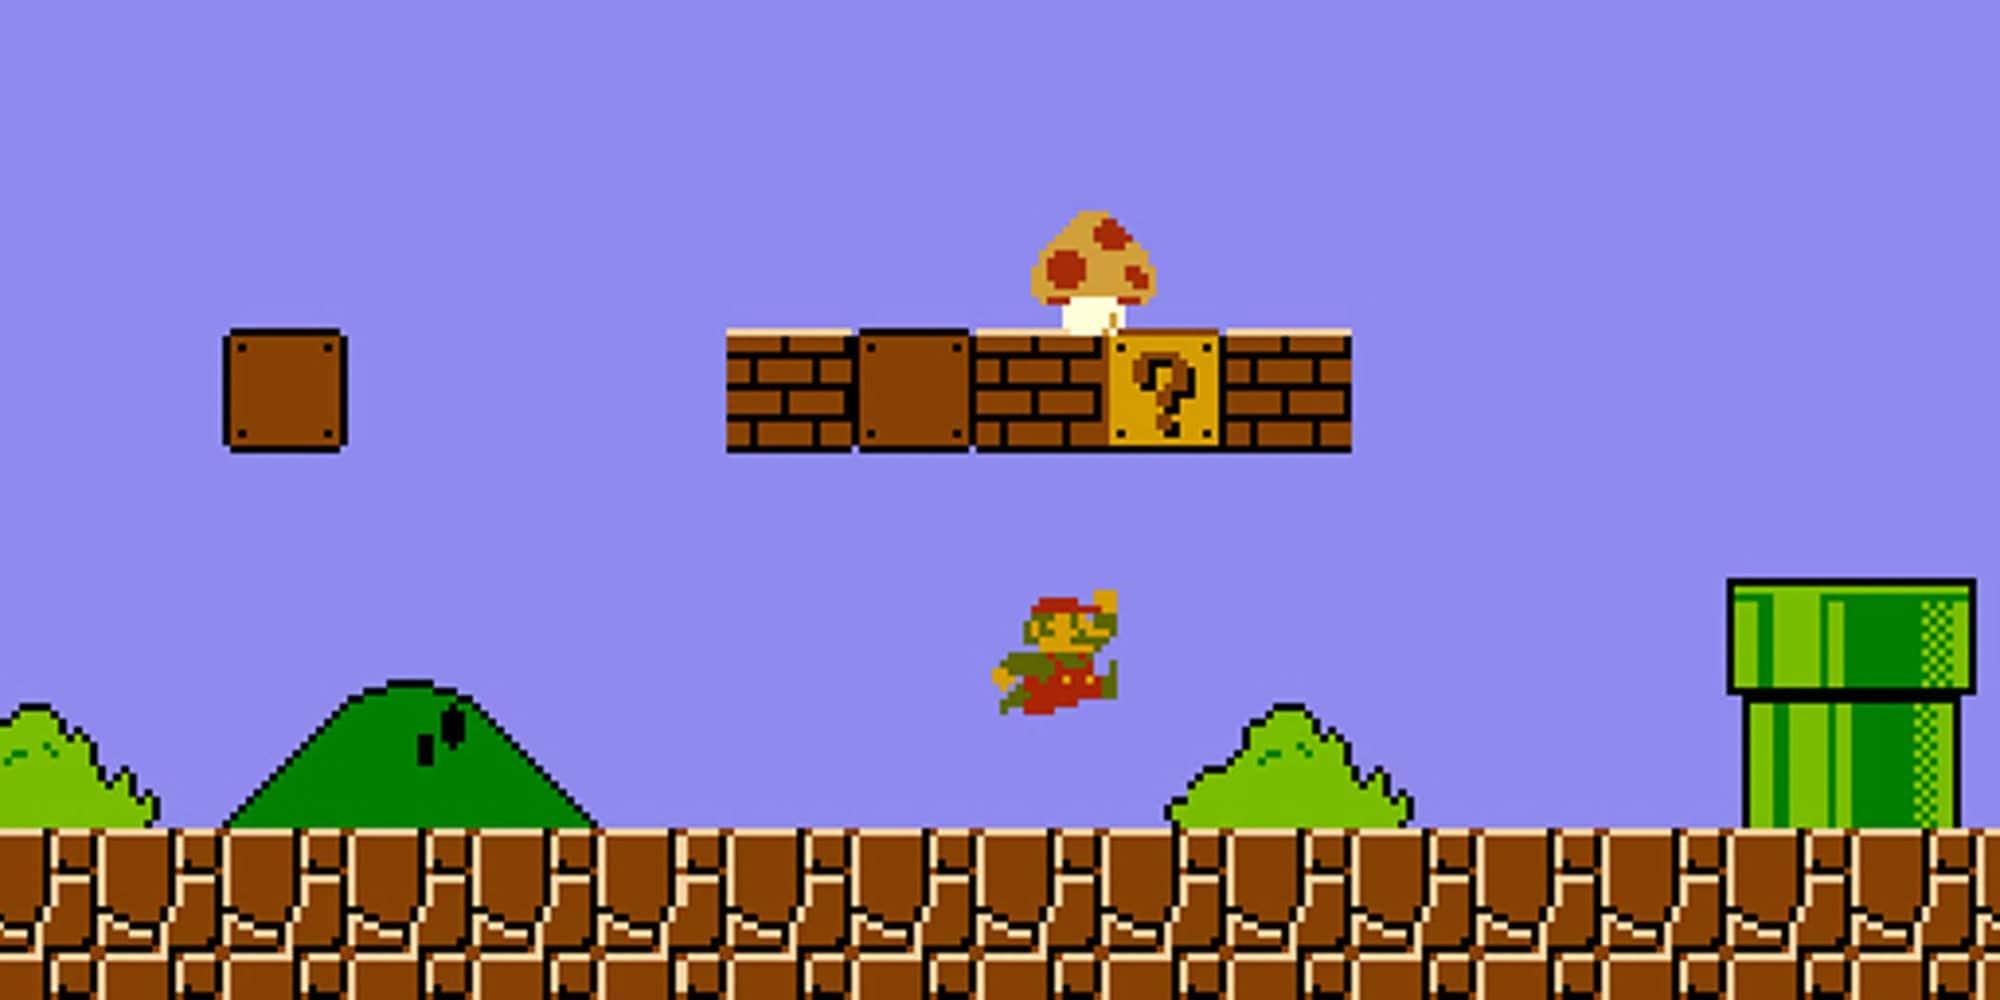 Super-Mario-Bros-screenshot-GamersRD